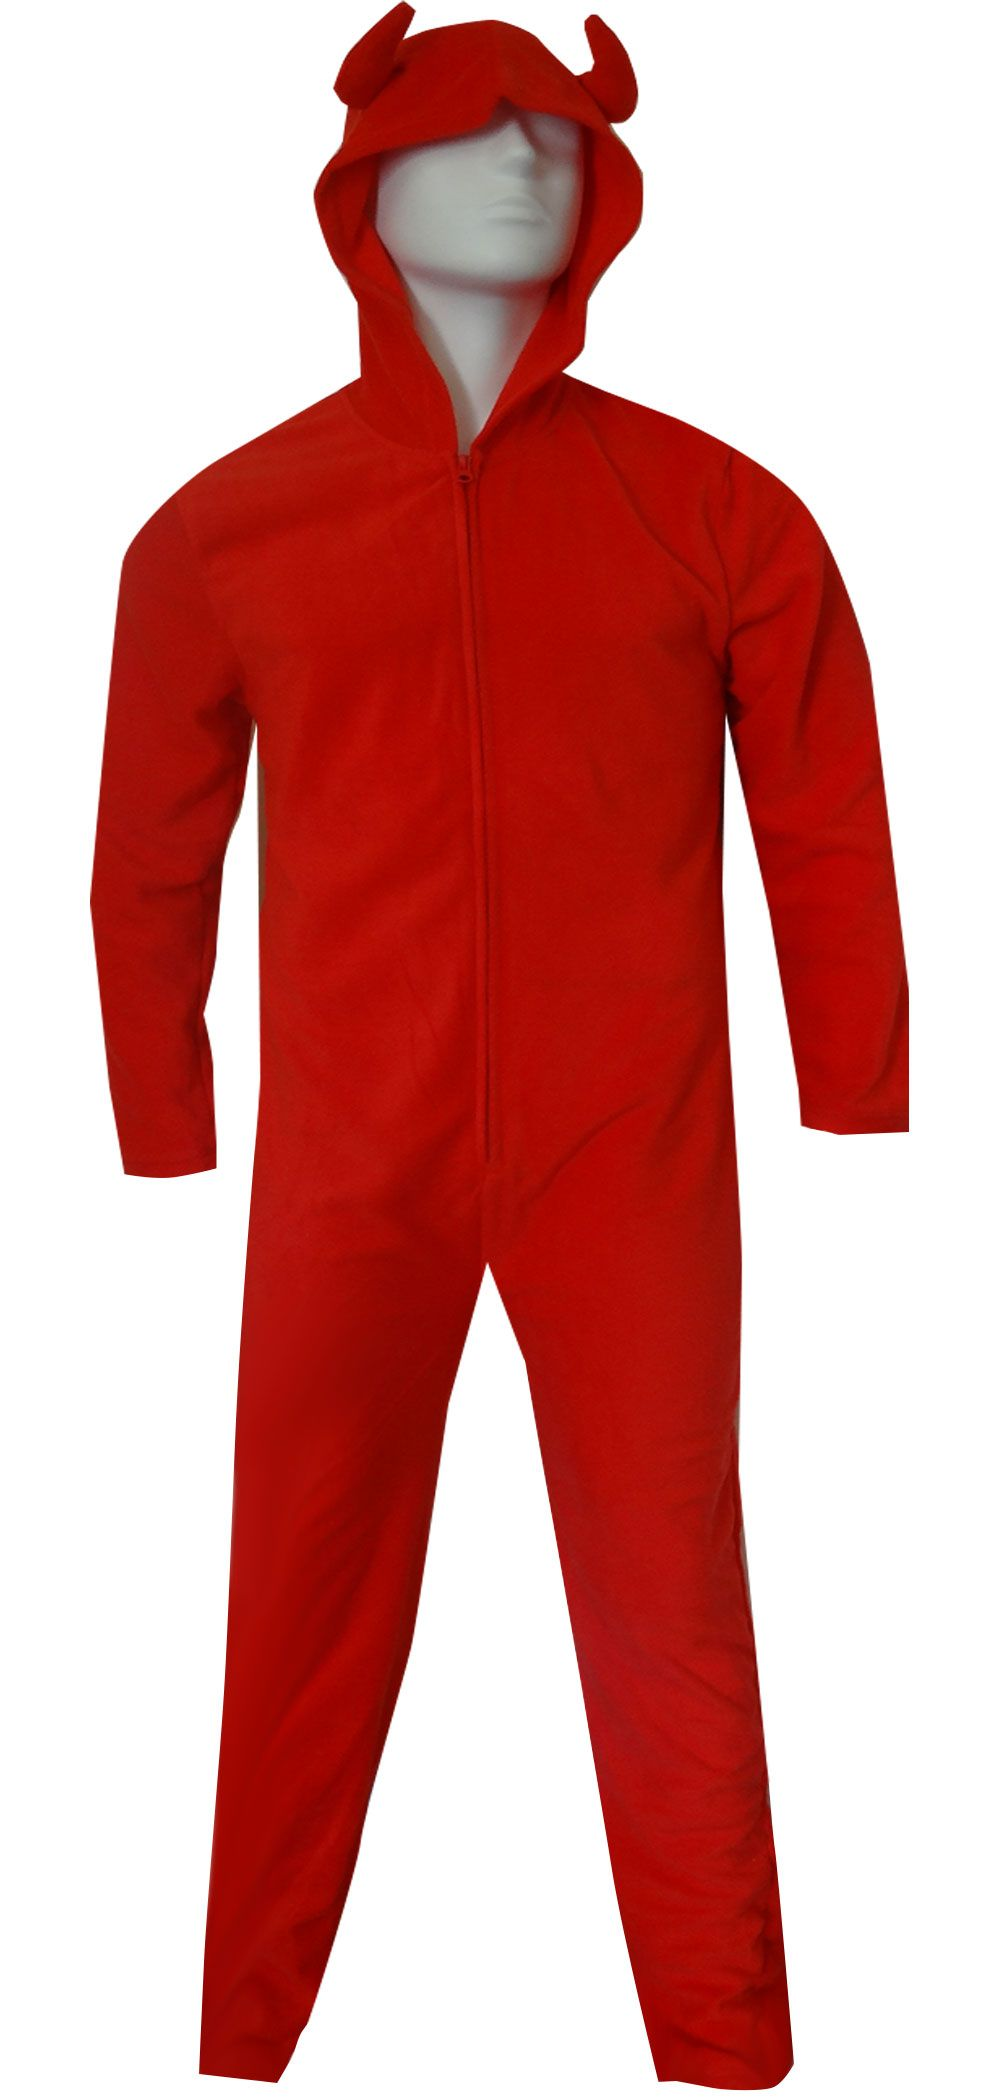 WebUndies.com Unisex Hooded Red Devil Onesie Pajama 014c9c444